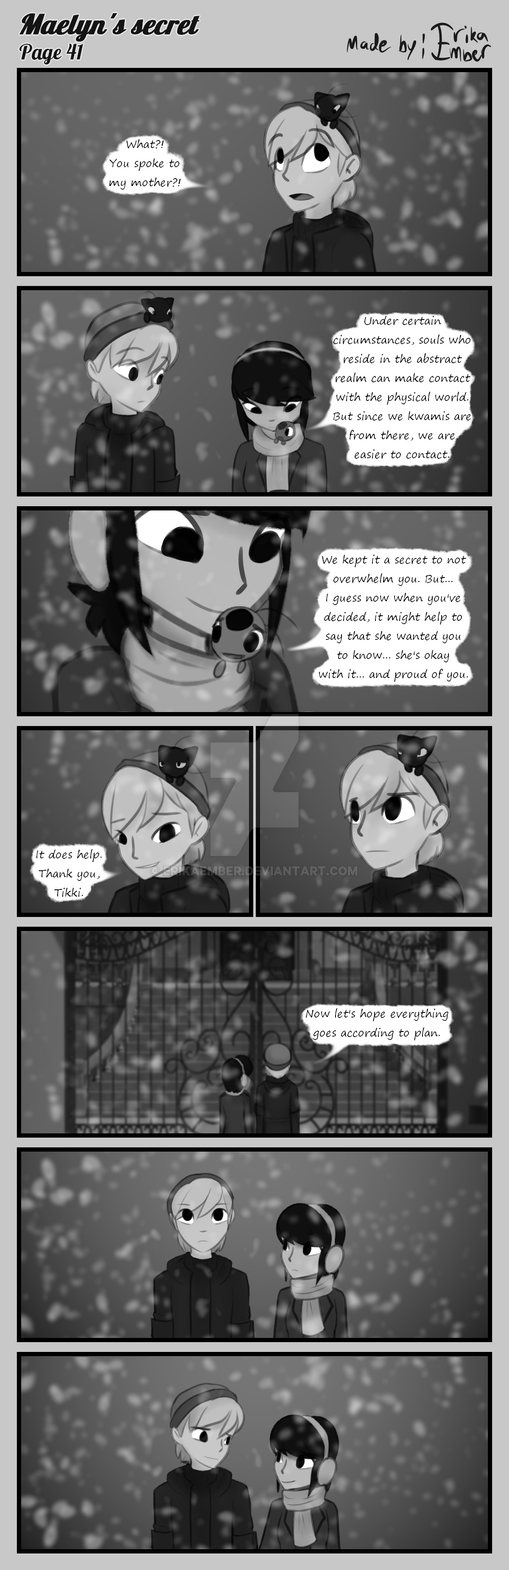 Maelyn's Secret - Page 41